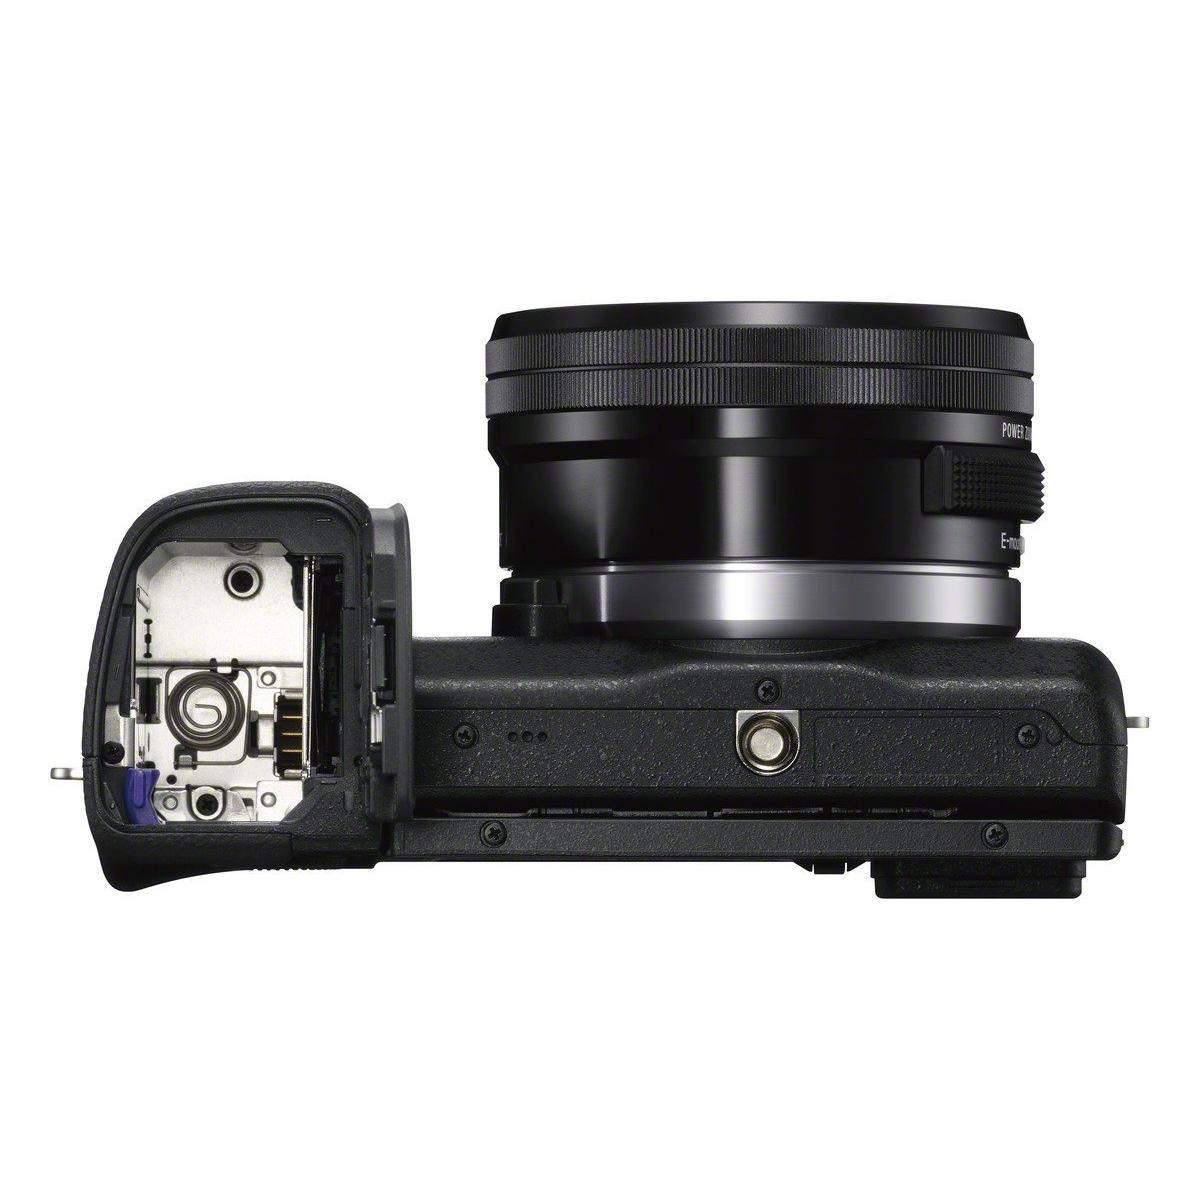 Hybride - Sony Nex-6 + Objectif 16-50 mm - Noir